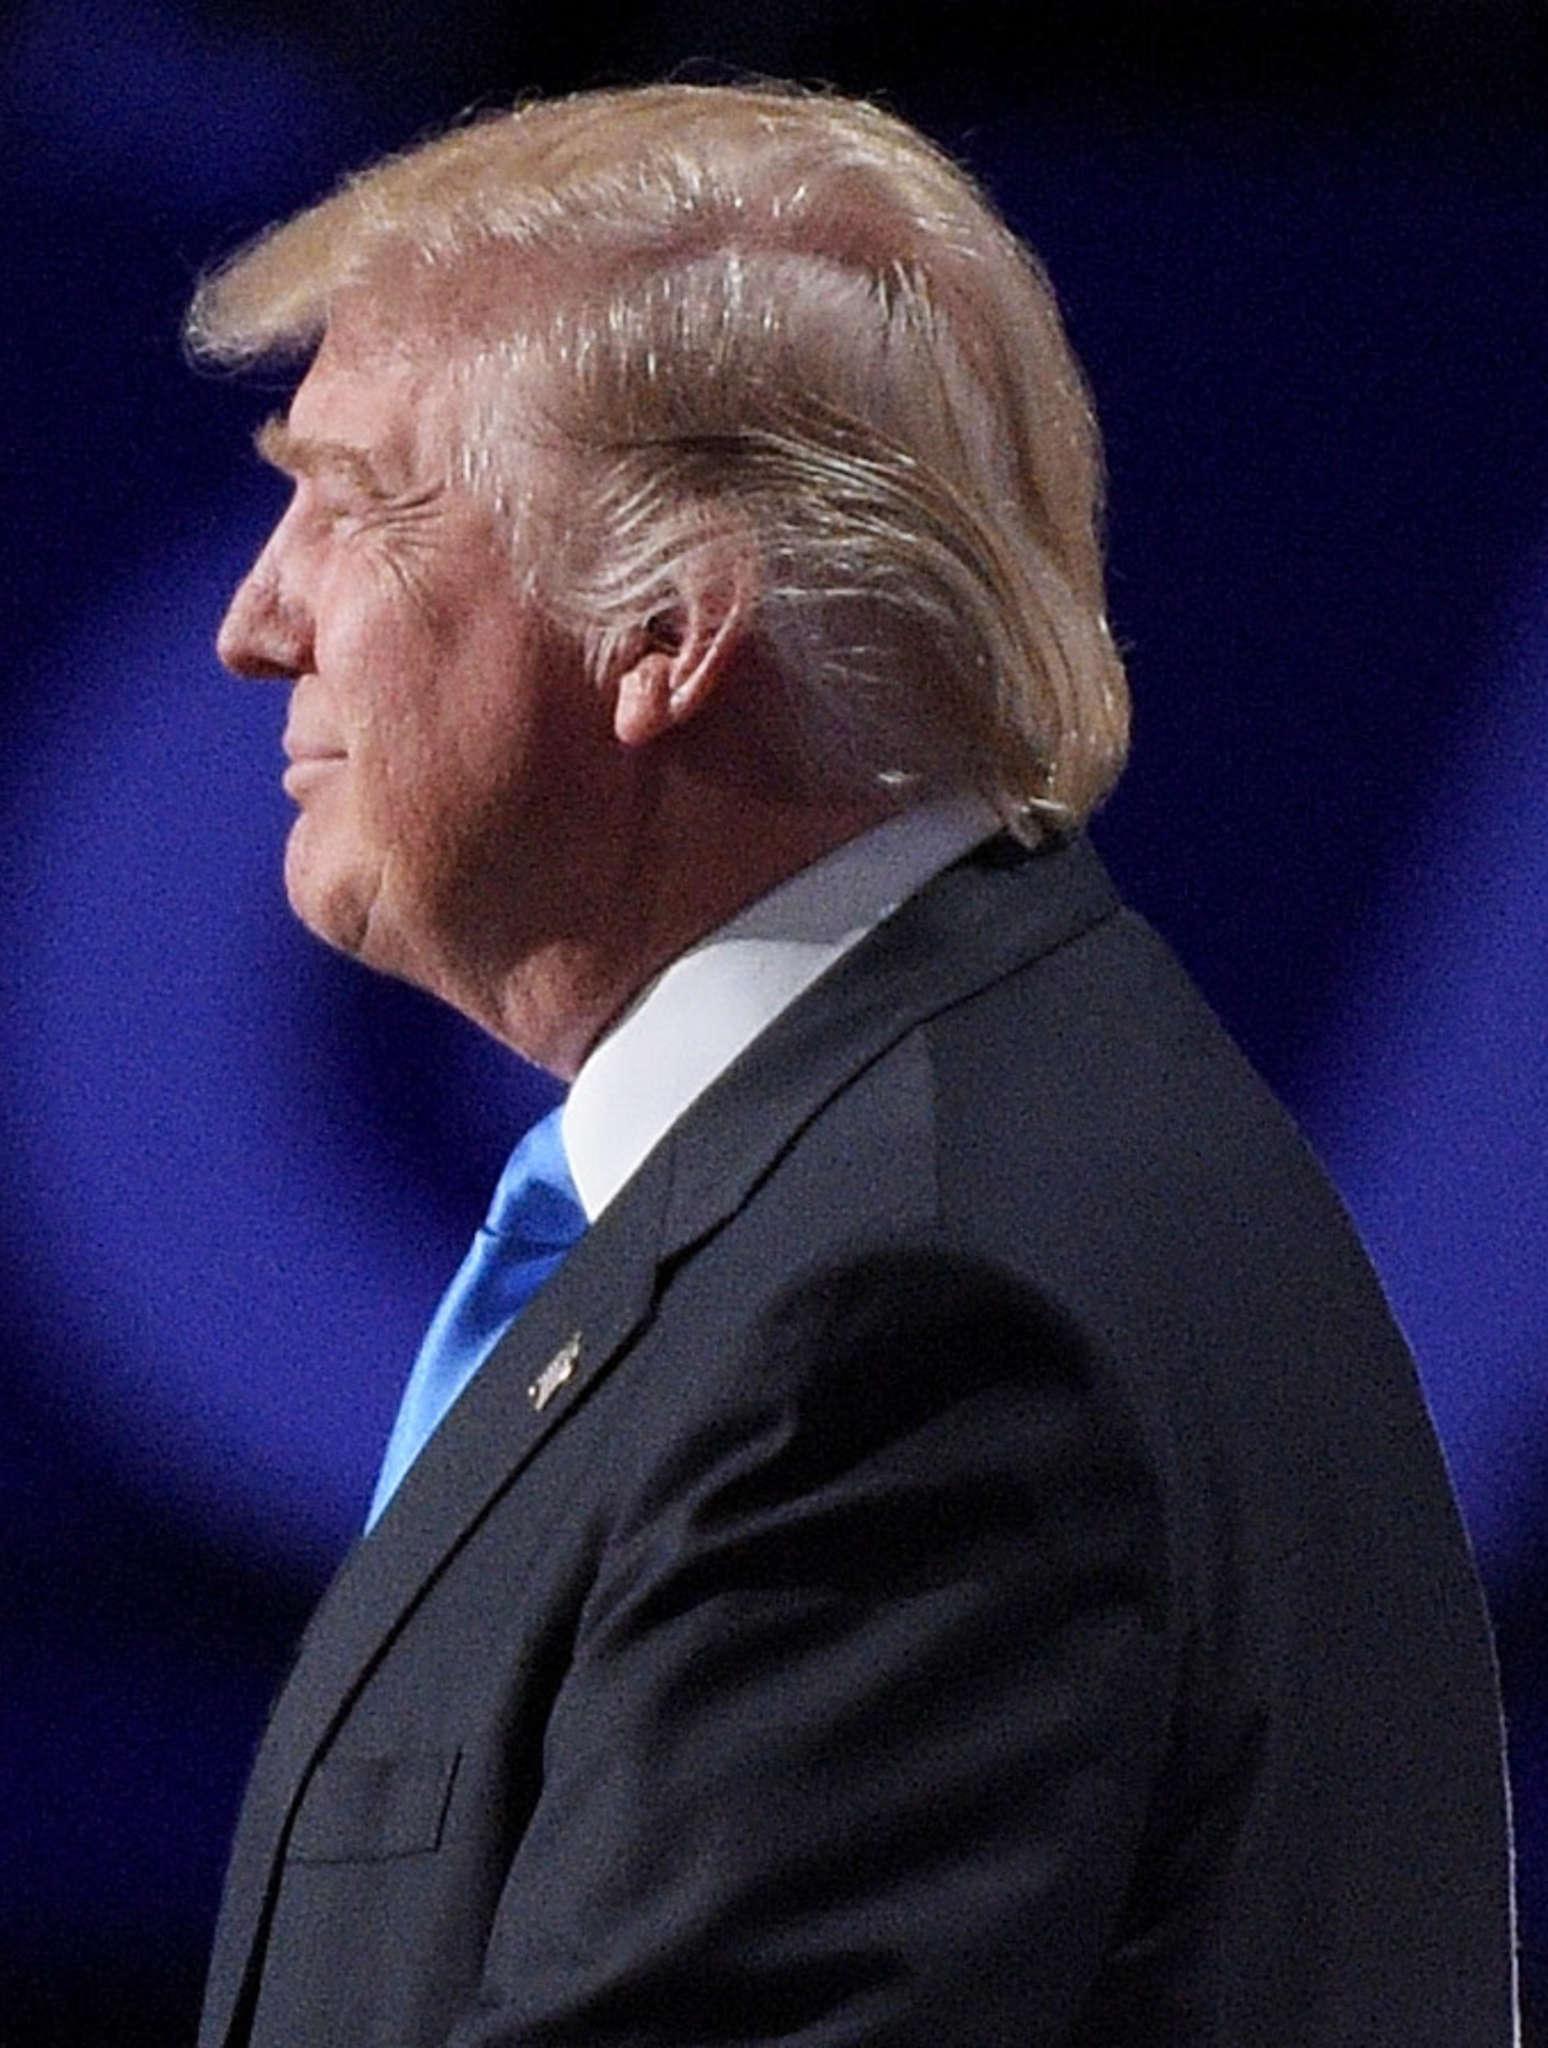 Trump's positions